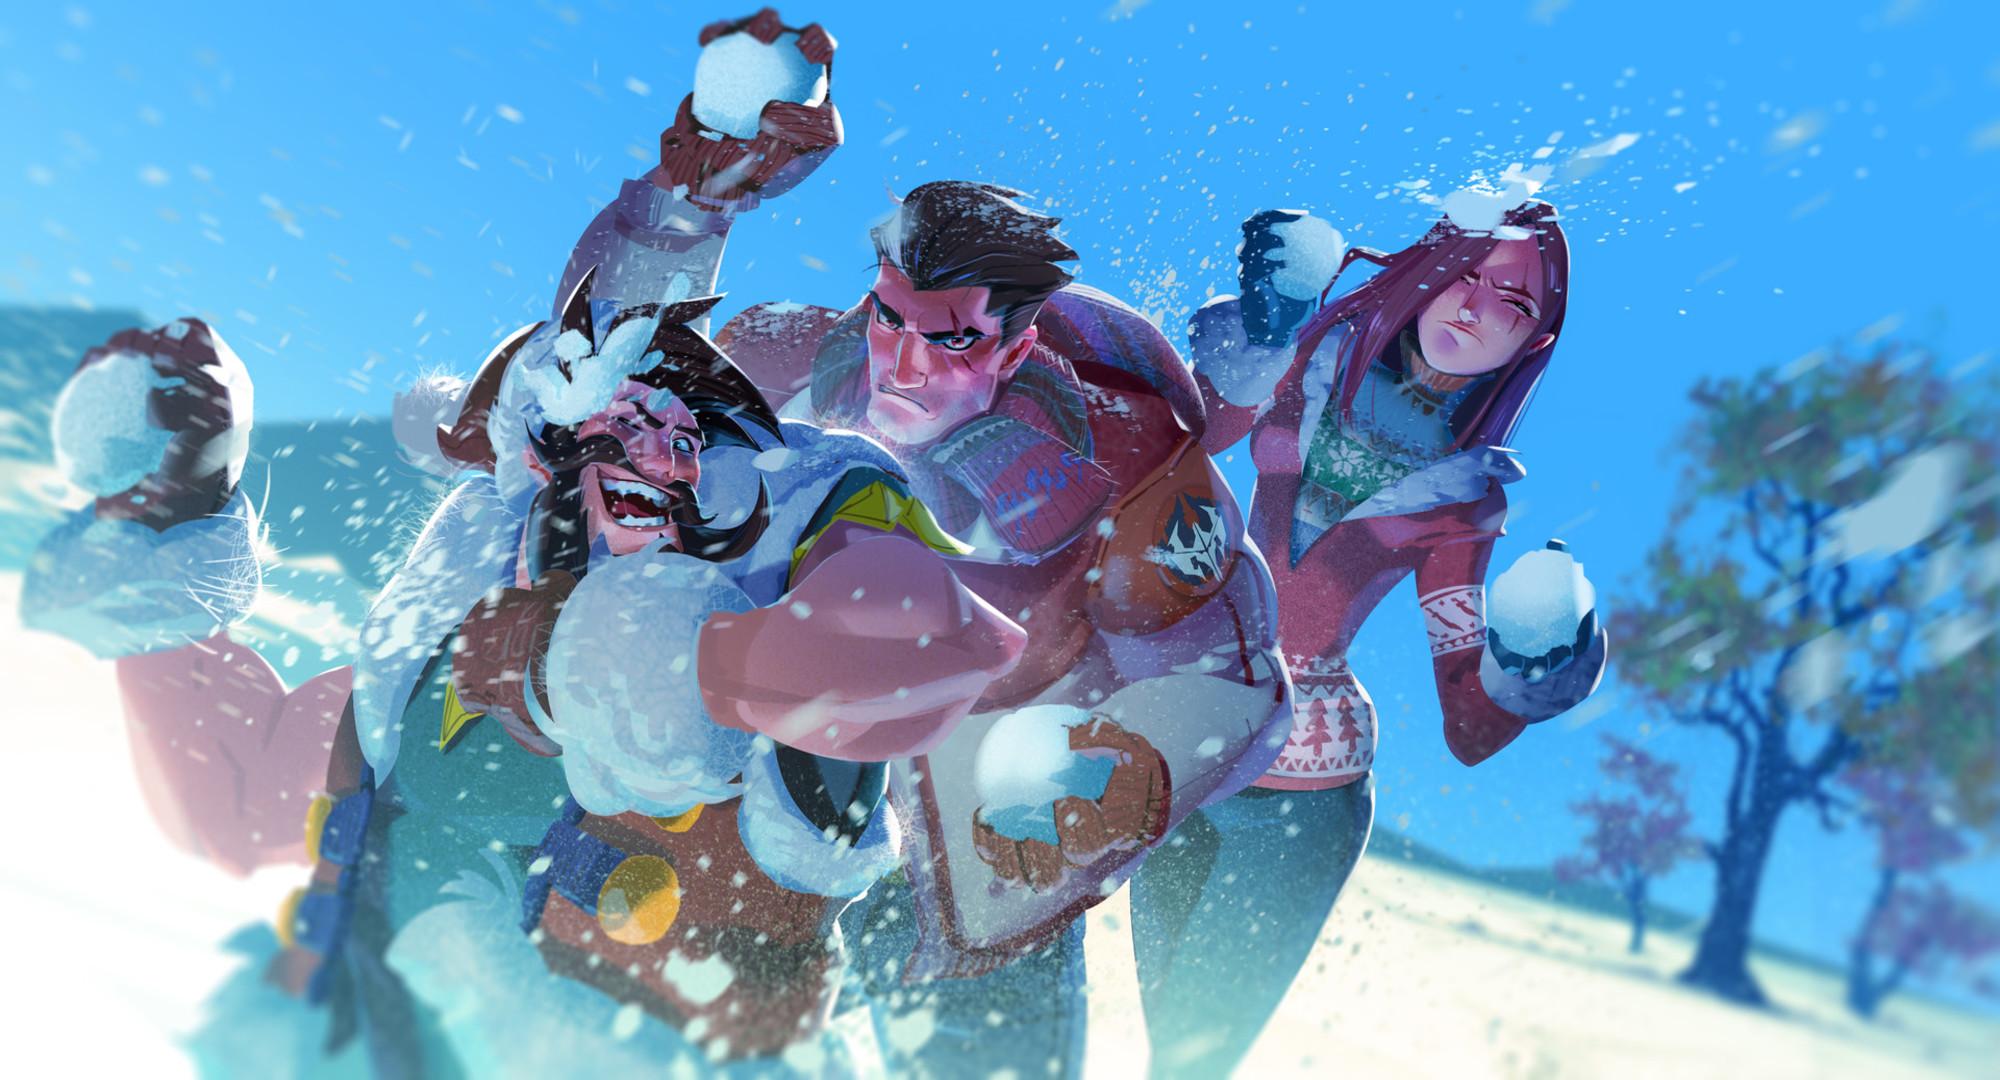 Darius League Of Legends Katarina League Of Legends Draven League Of Legends Snow 2000x1080